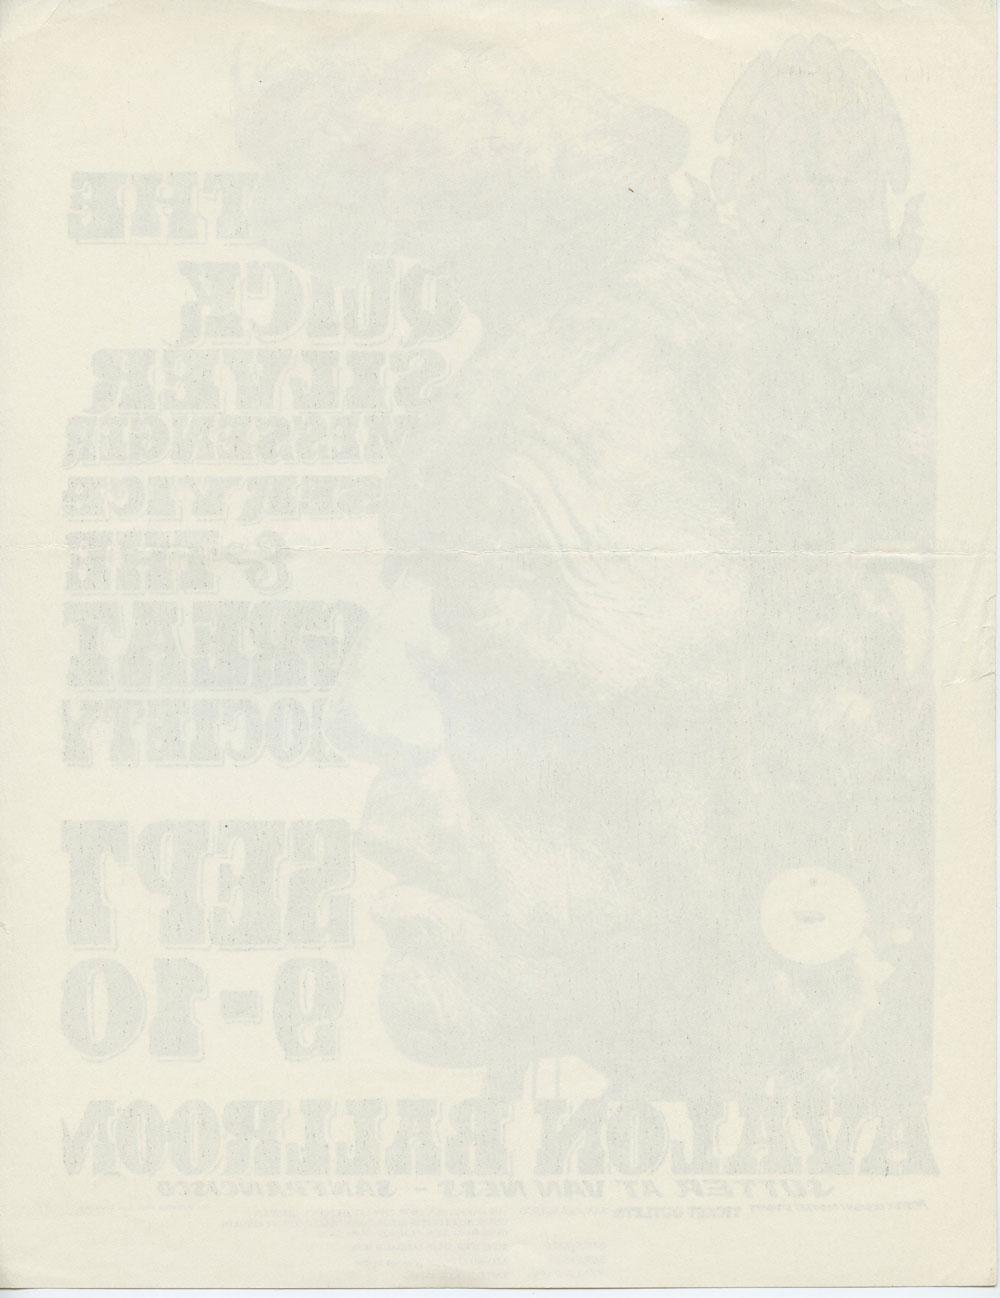 Family Dog 025 Handbill  1966 Sep 9 Indian Quicksilver Messenger Service